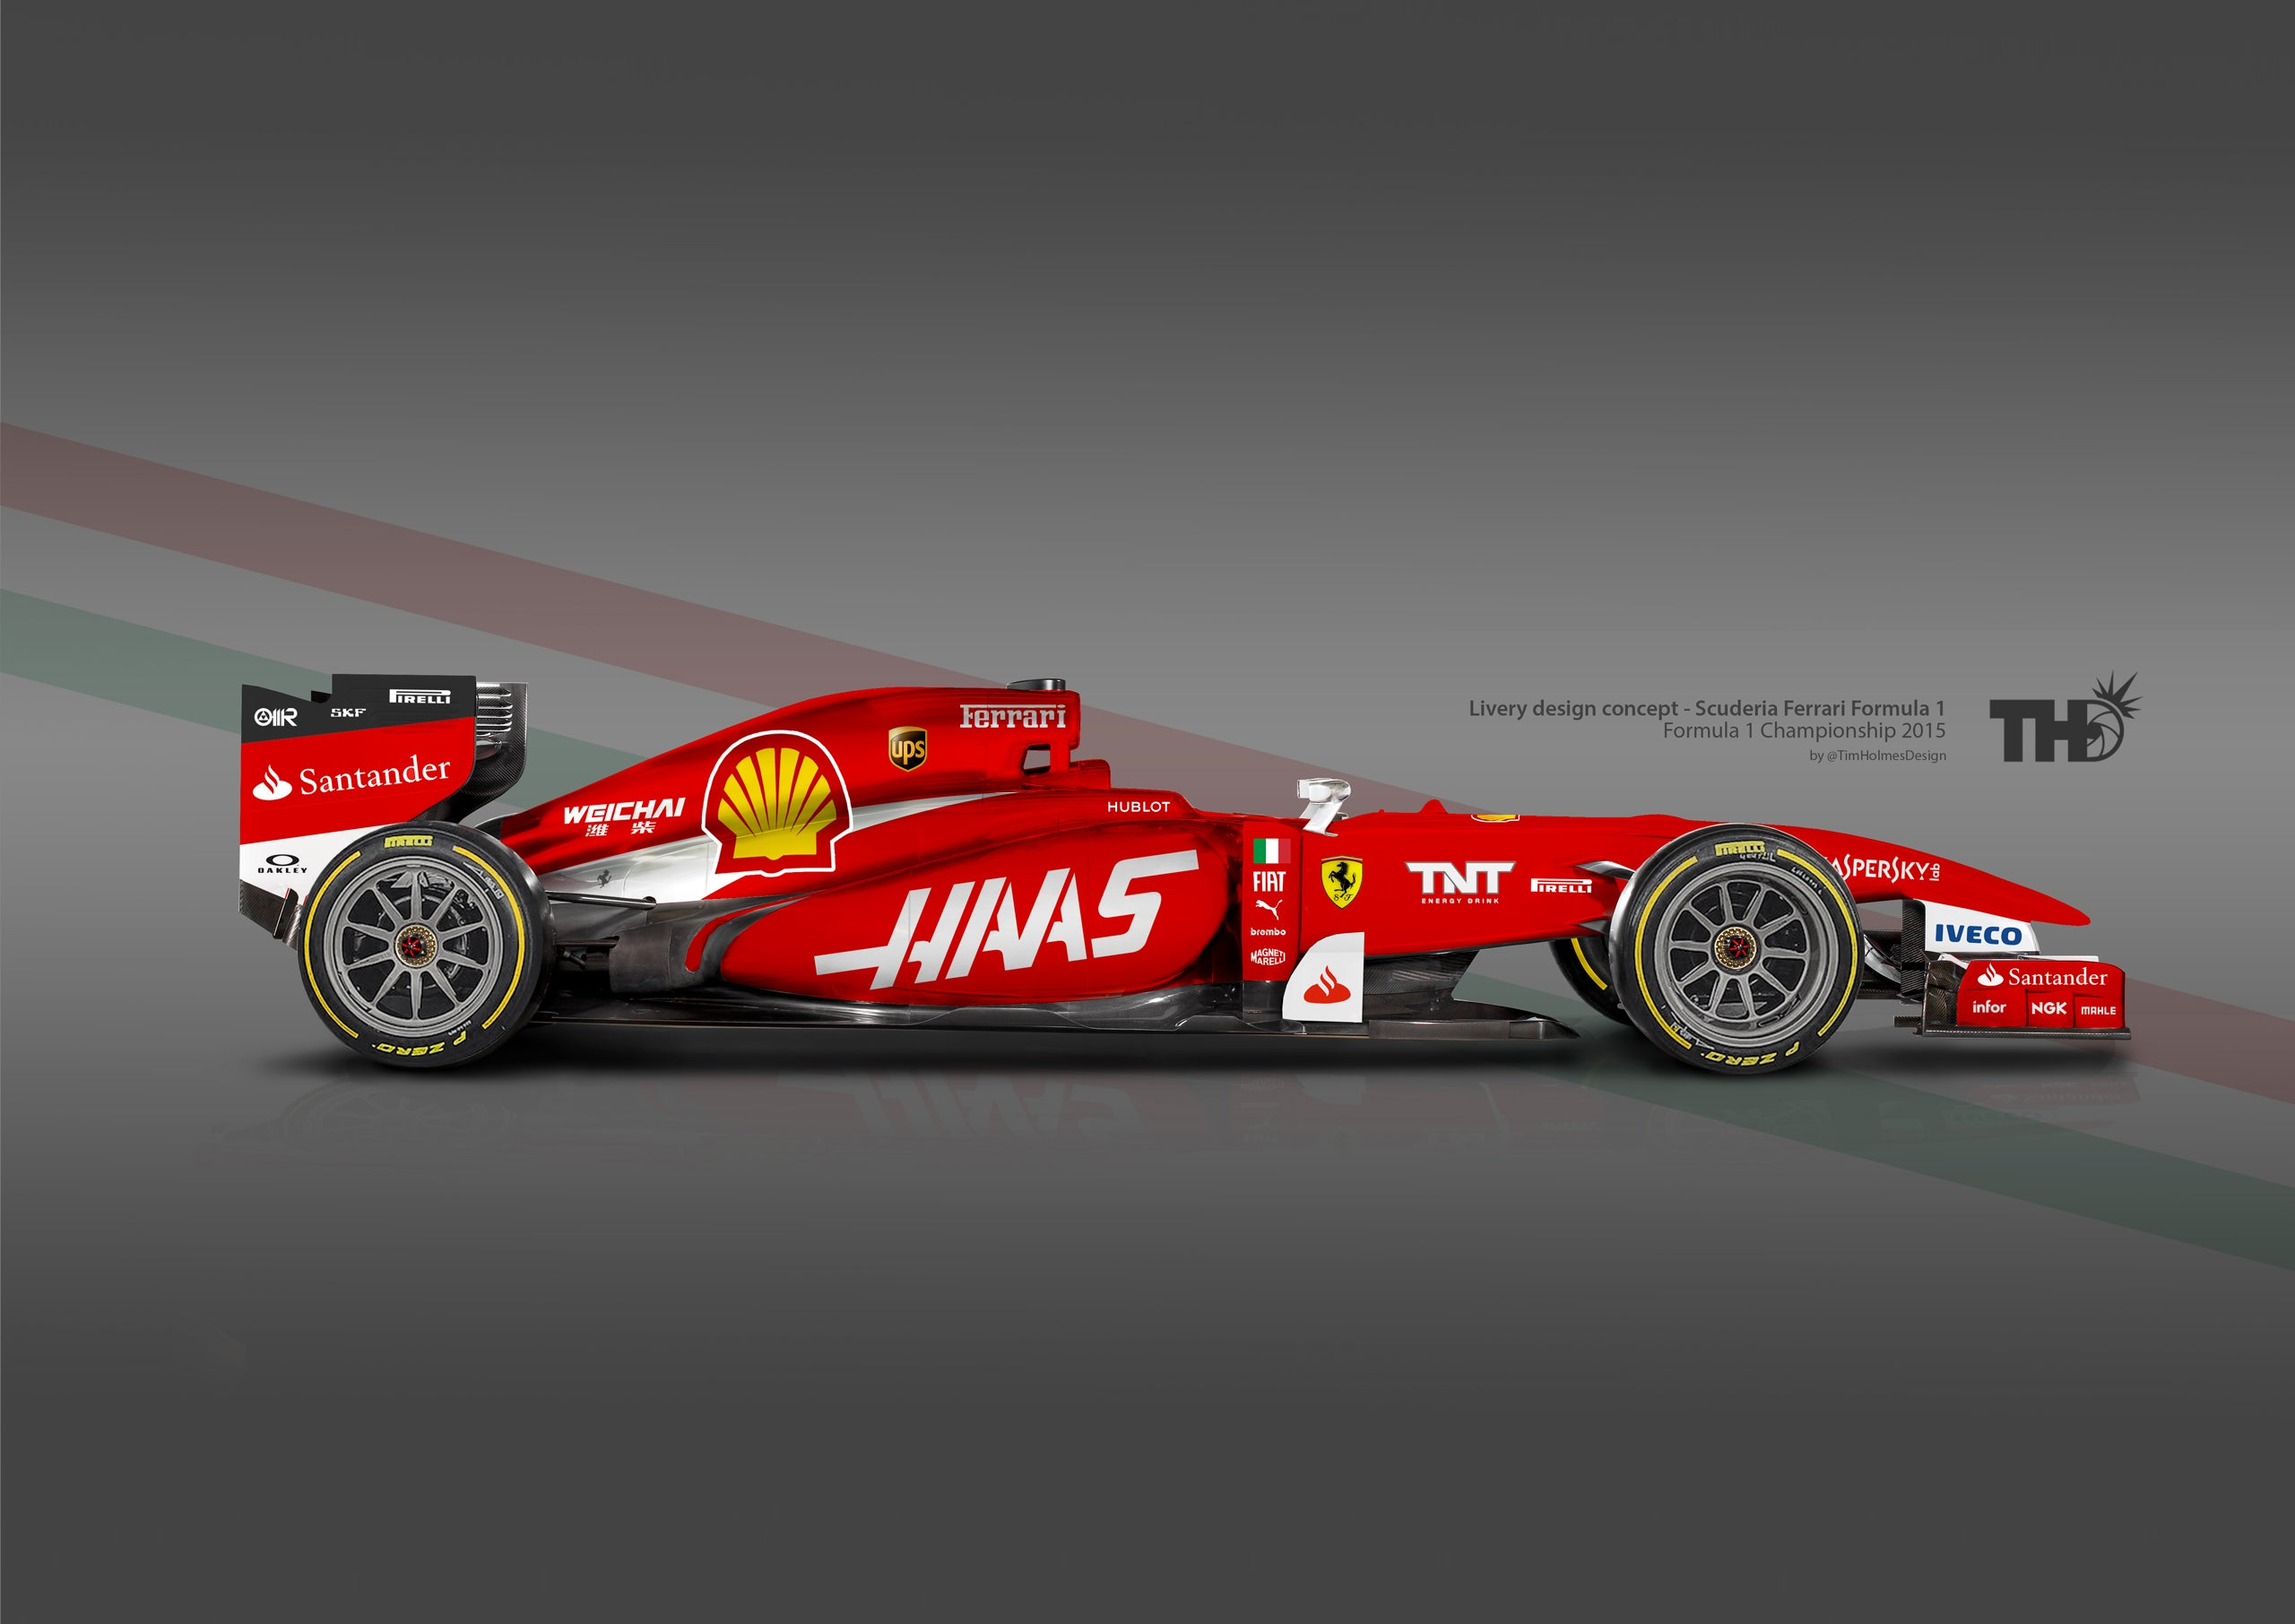 Ferrari Team f1 2015 Sexy 2015 Ferrari f1 Livery